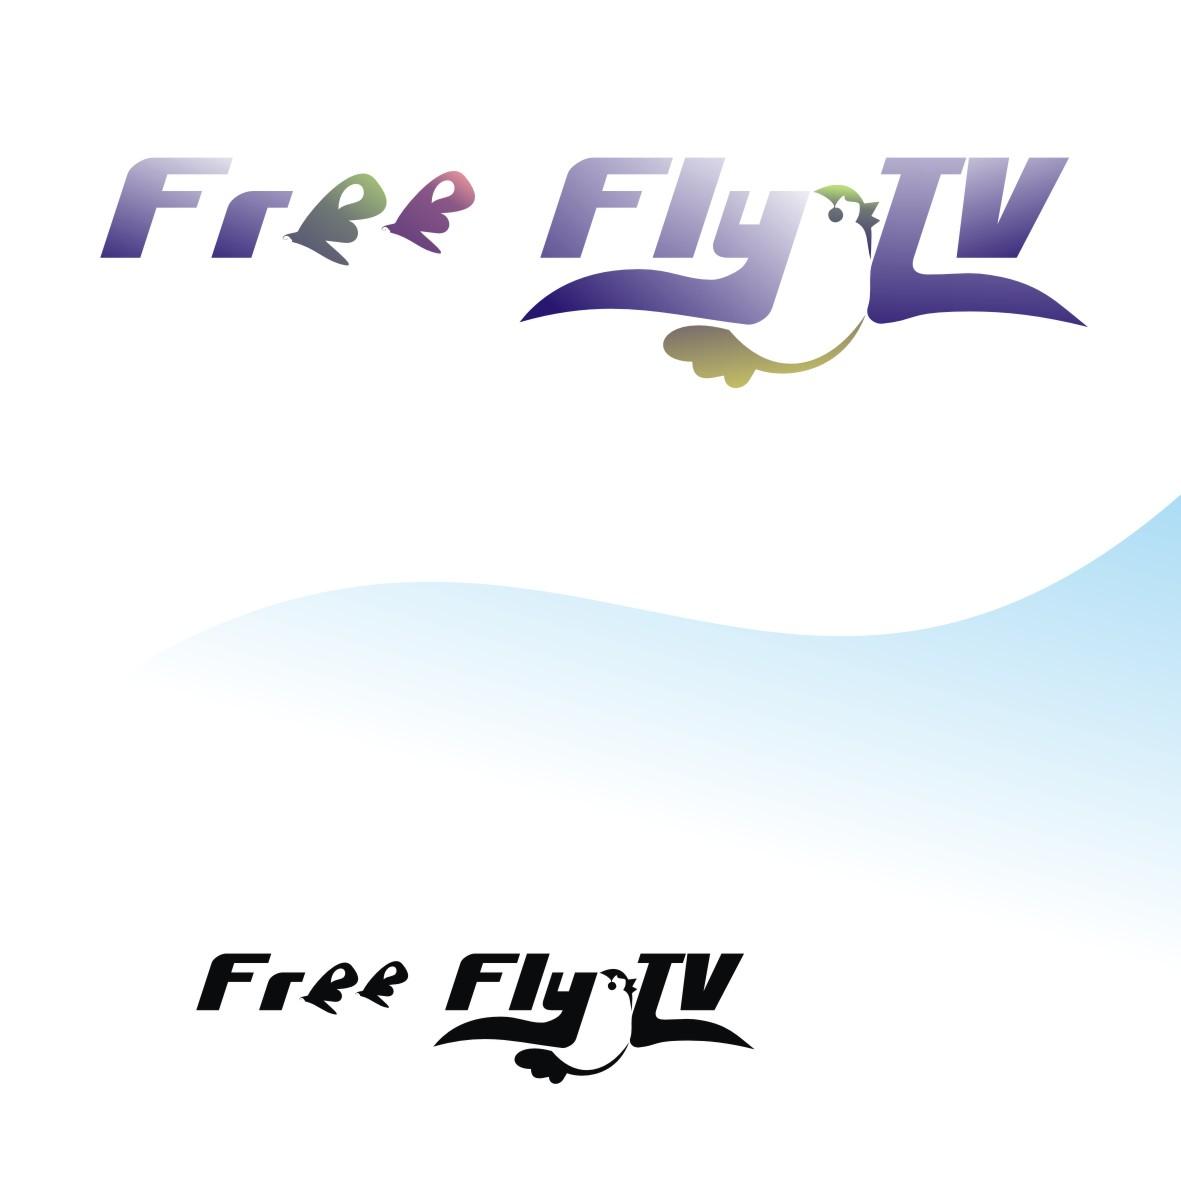 Логотип для общественного интернет-телевидения FreeFly фото f_4f97c353b5db1.jpg